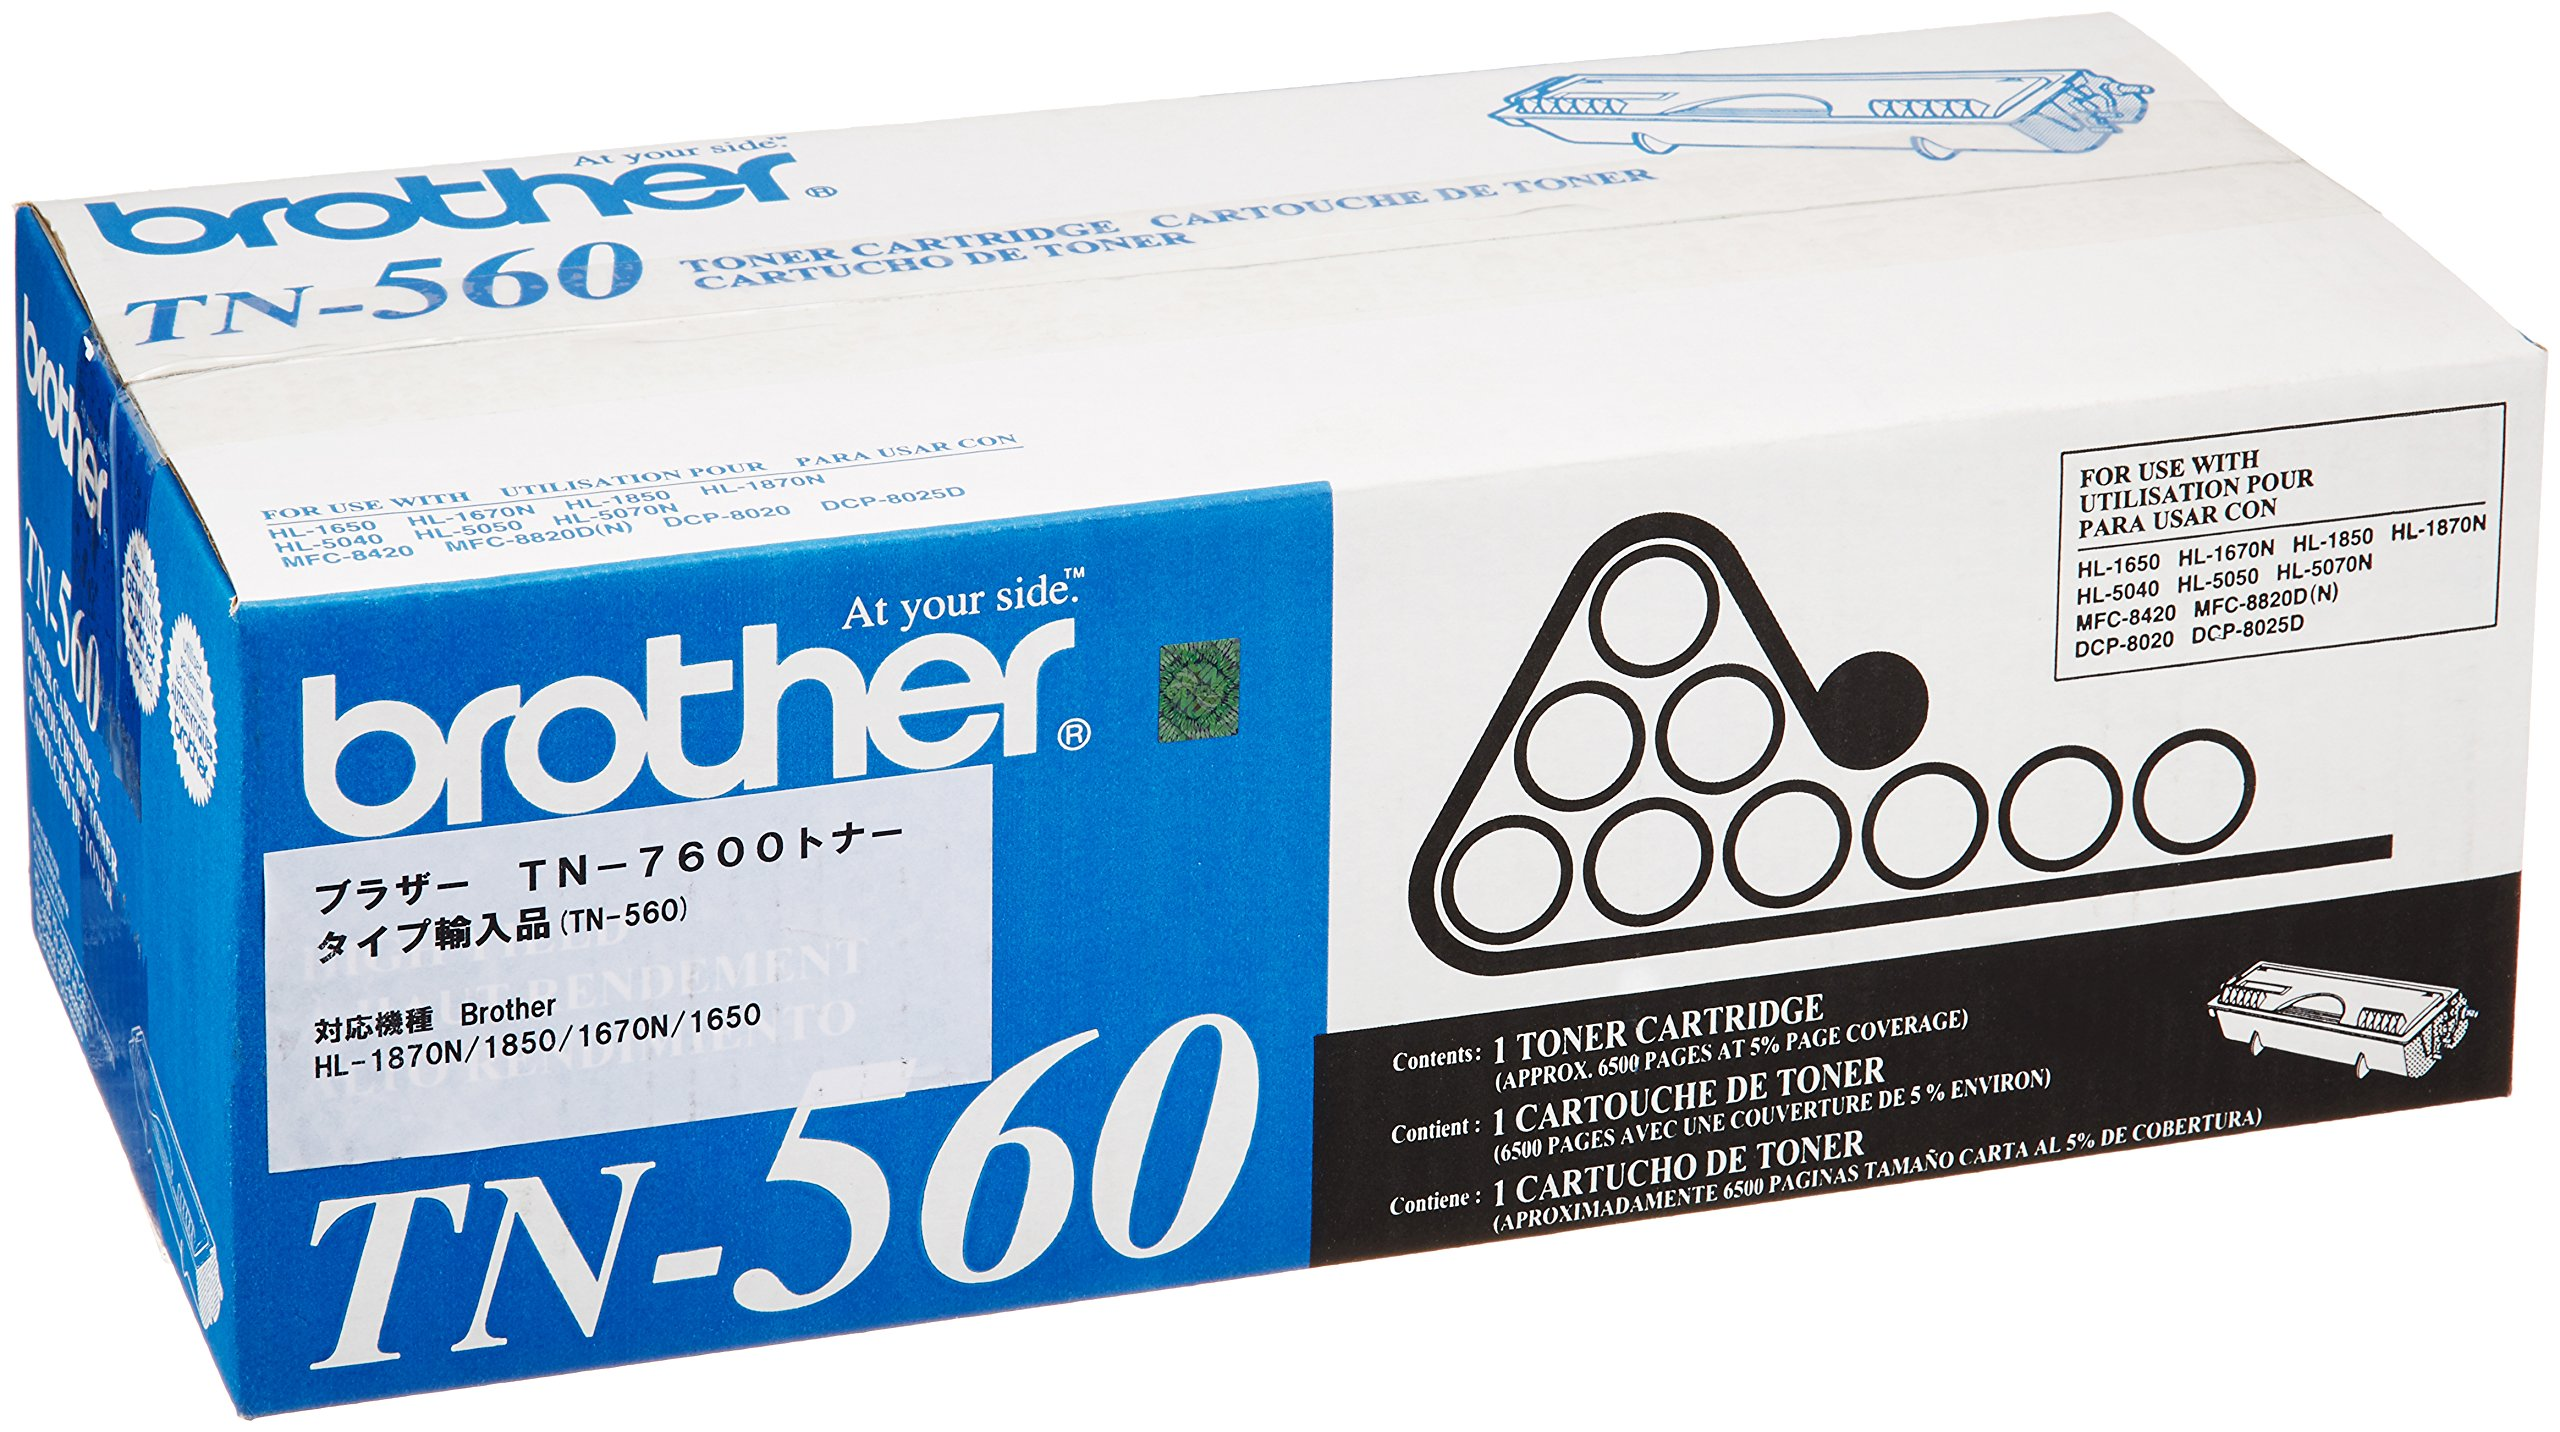 Brother TN-560 High-Yield Toner Cartridge - Retail Packaging